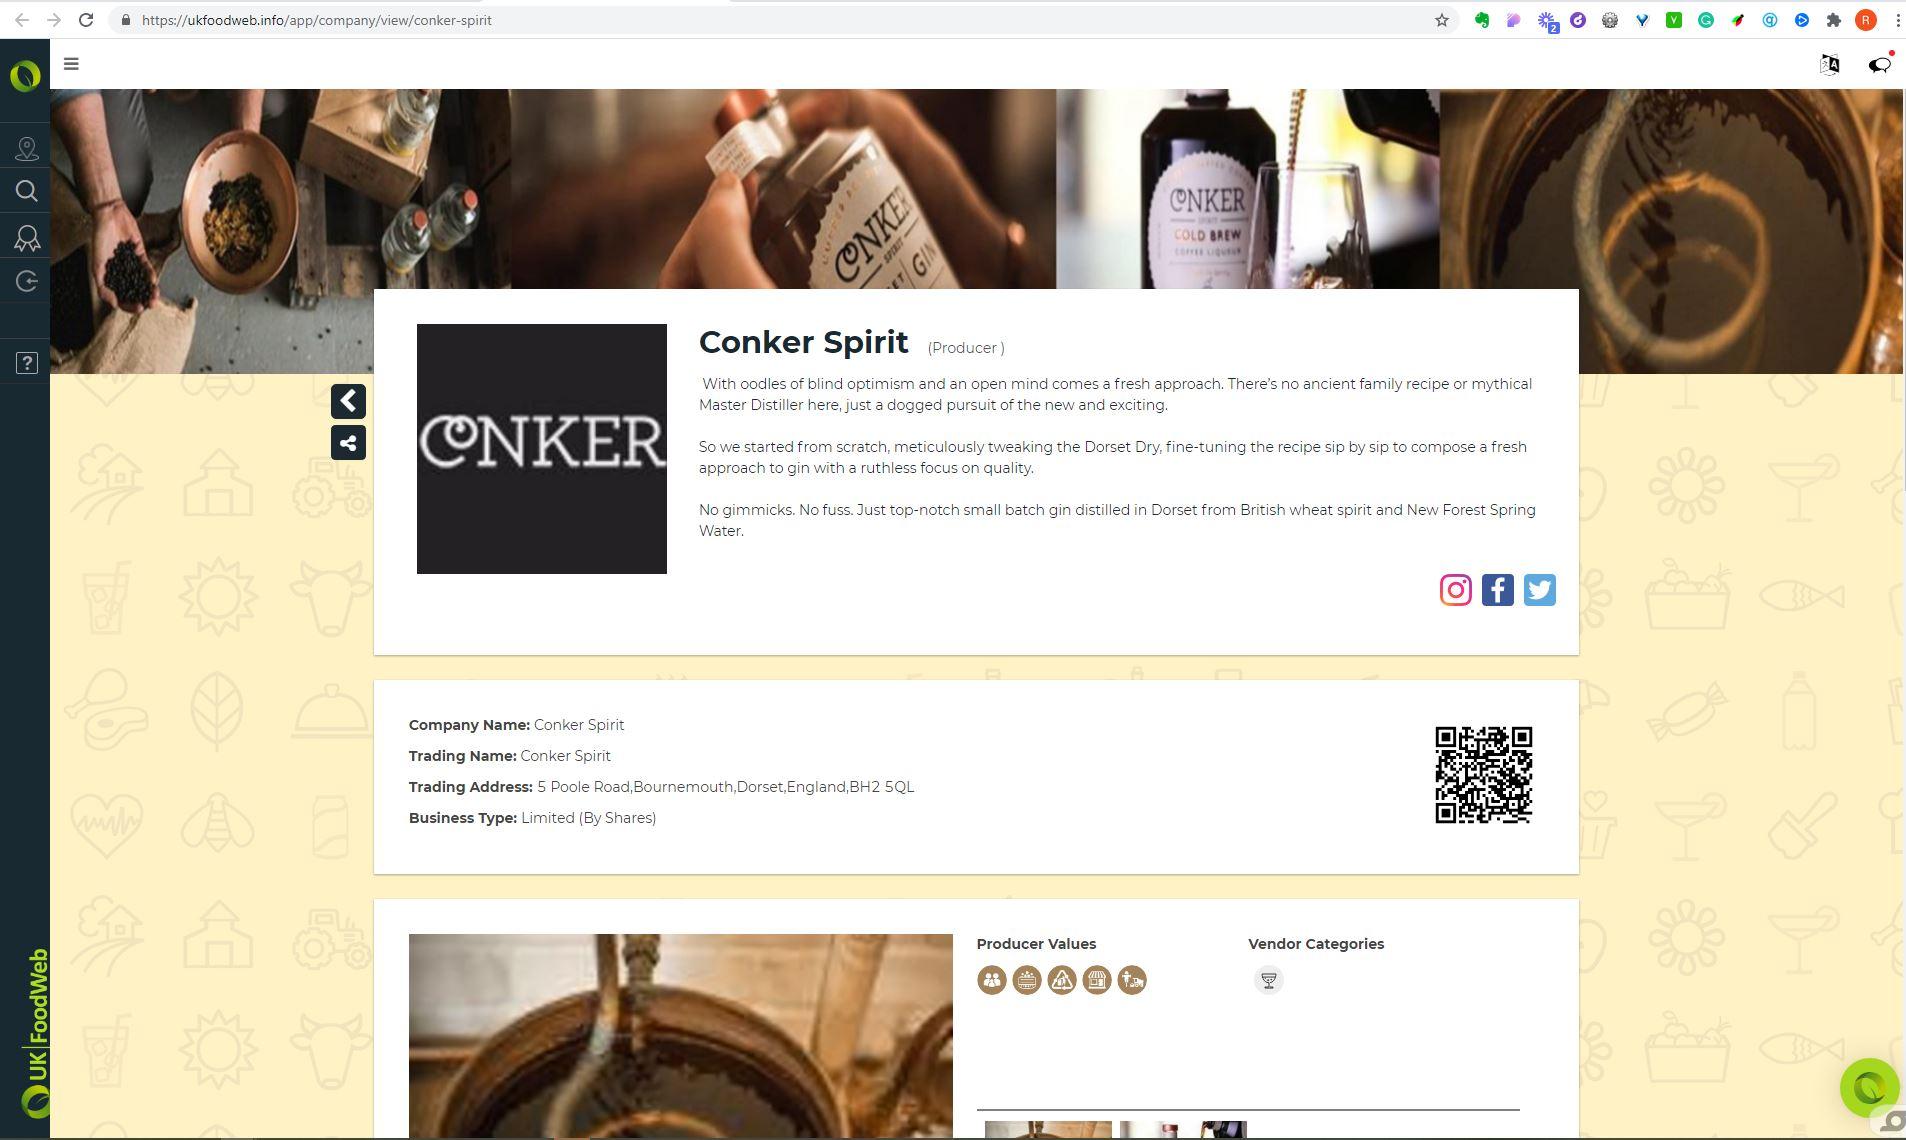 UKFoodWeb producer detail page screenshot